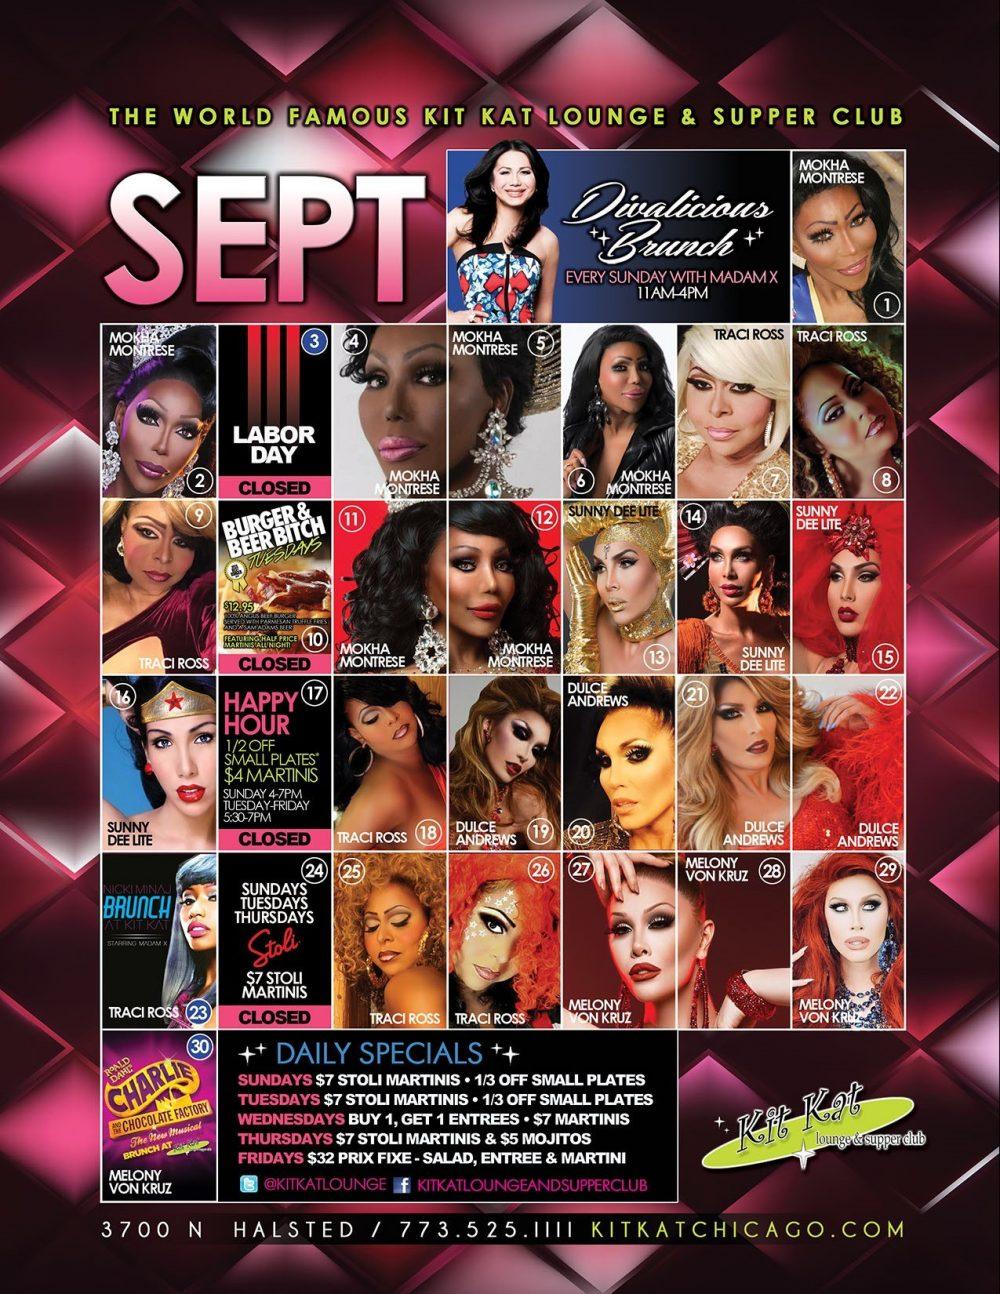 Kit Kat September 2018 Divas Calendar Image